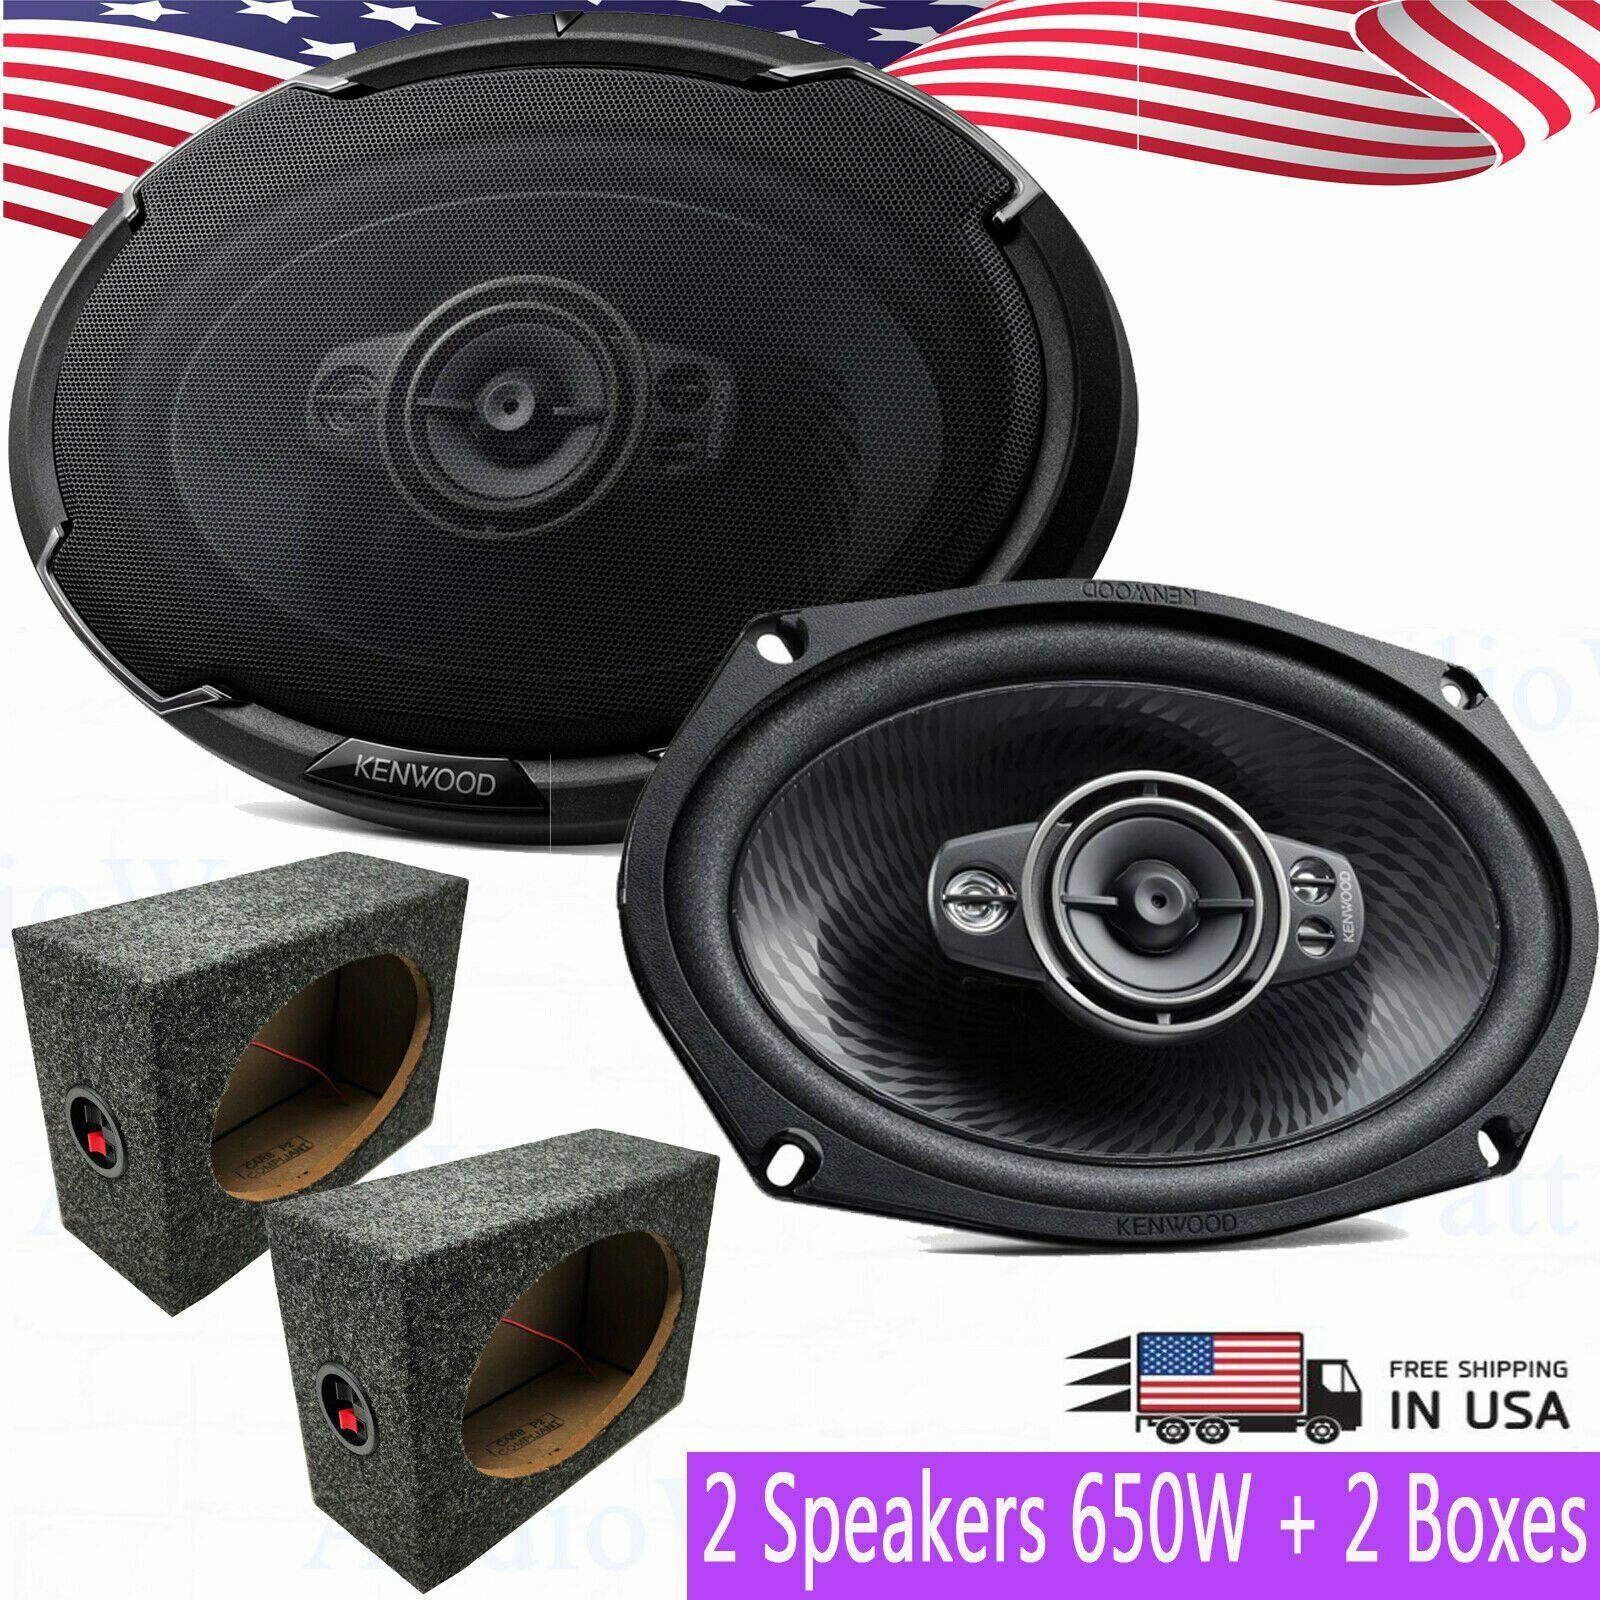 Kenwood KFC-6996PS 6x9 5 Way Car Speakers 650W Maximum Power Handling